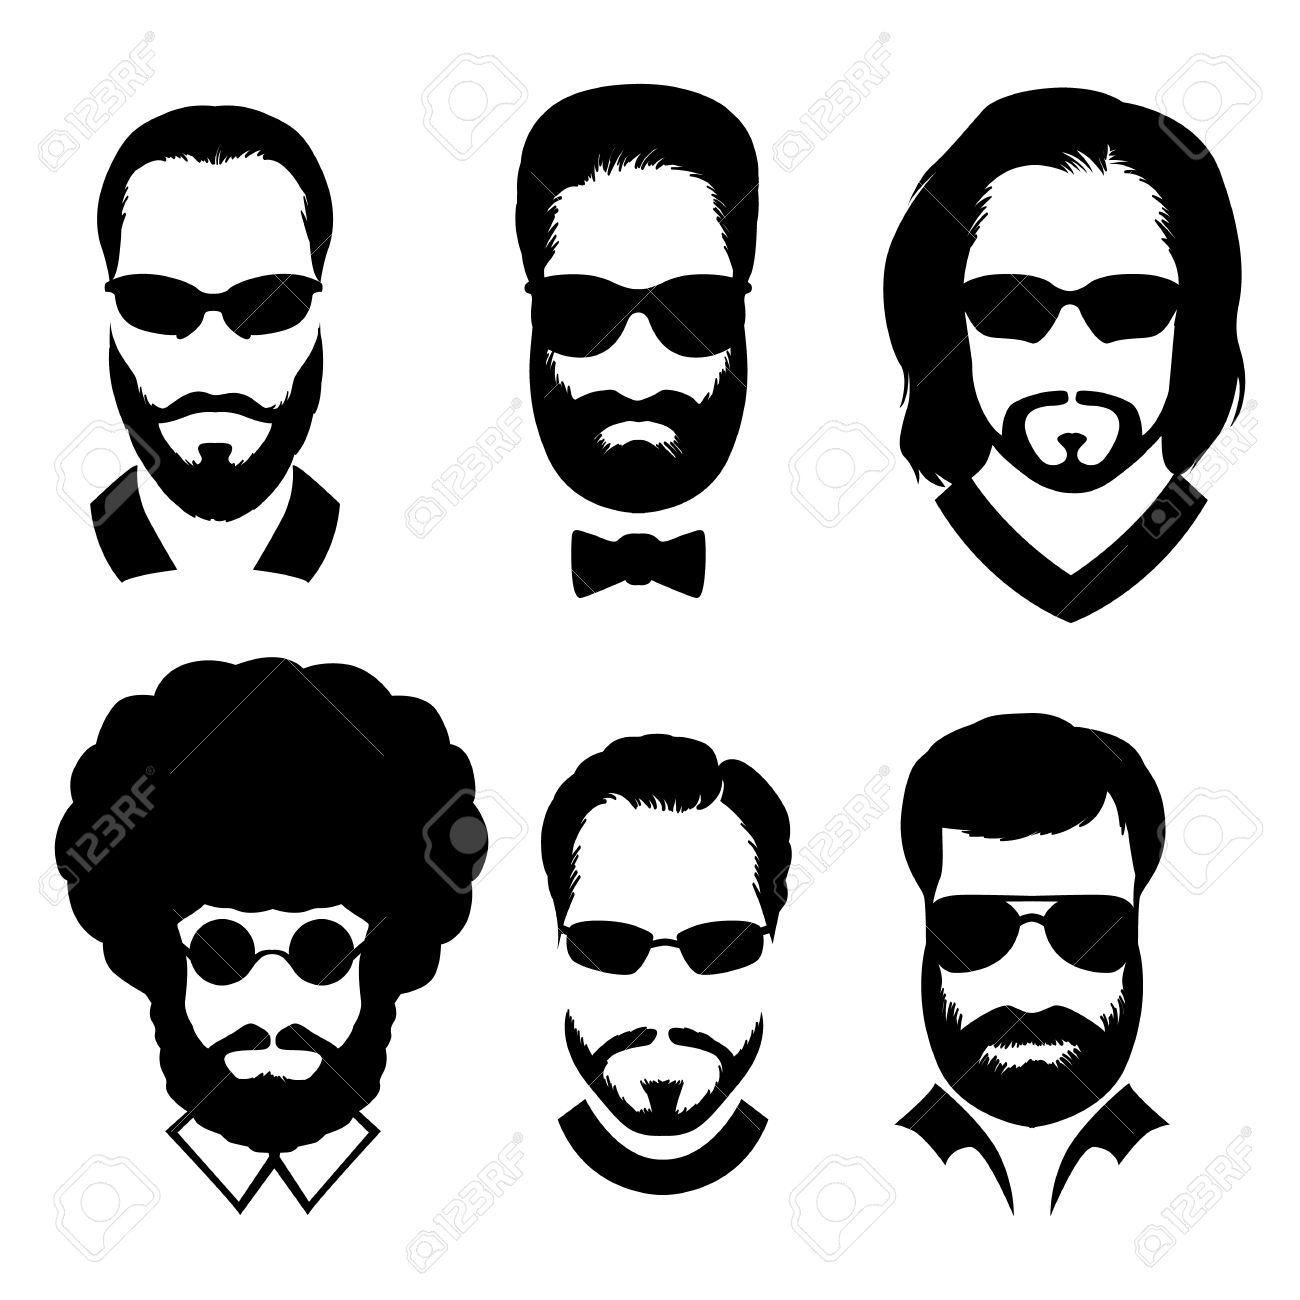 beard man cliparts free download best beard man cliparts